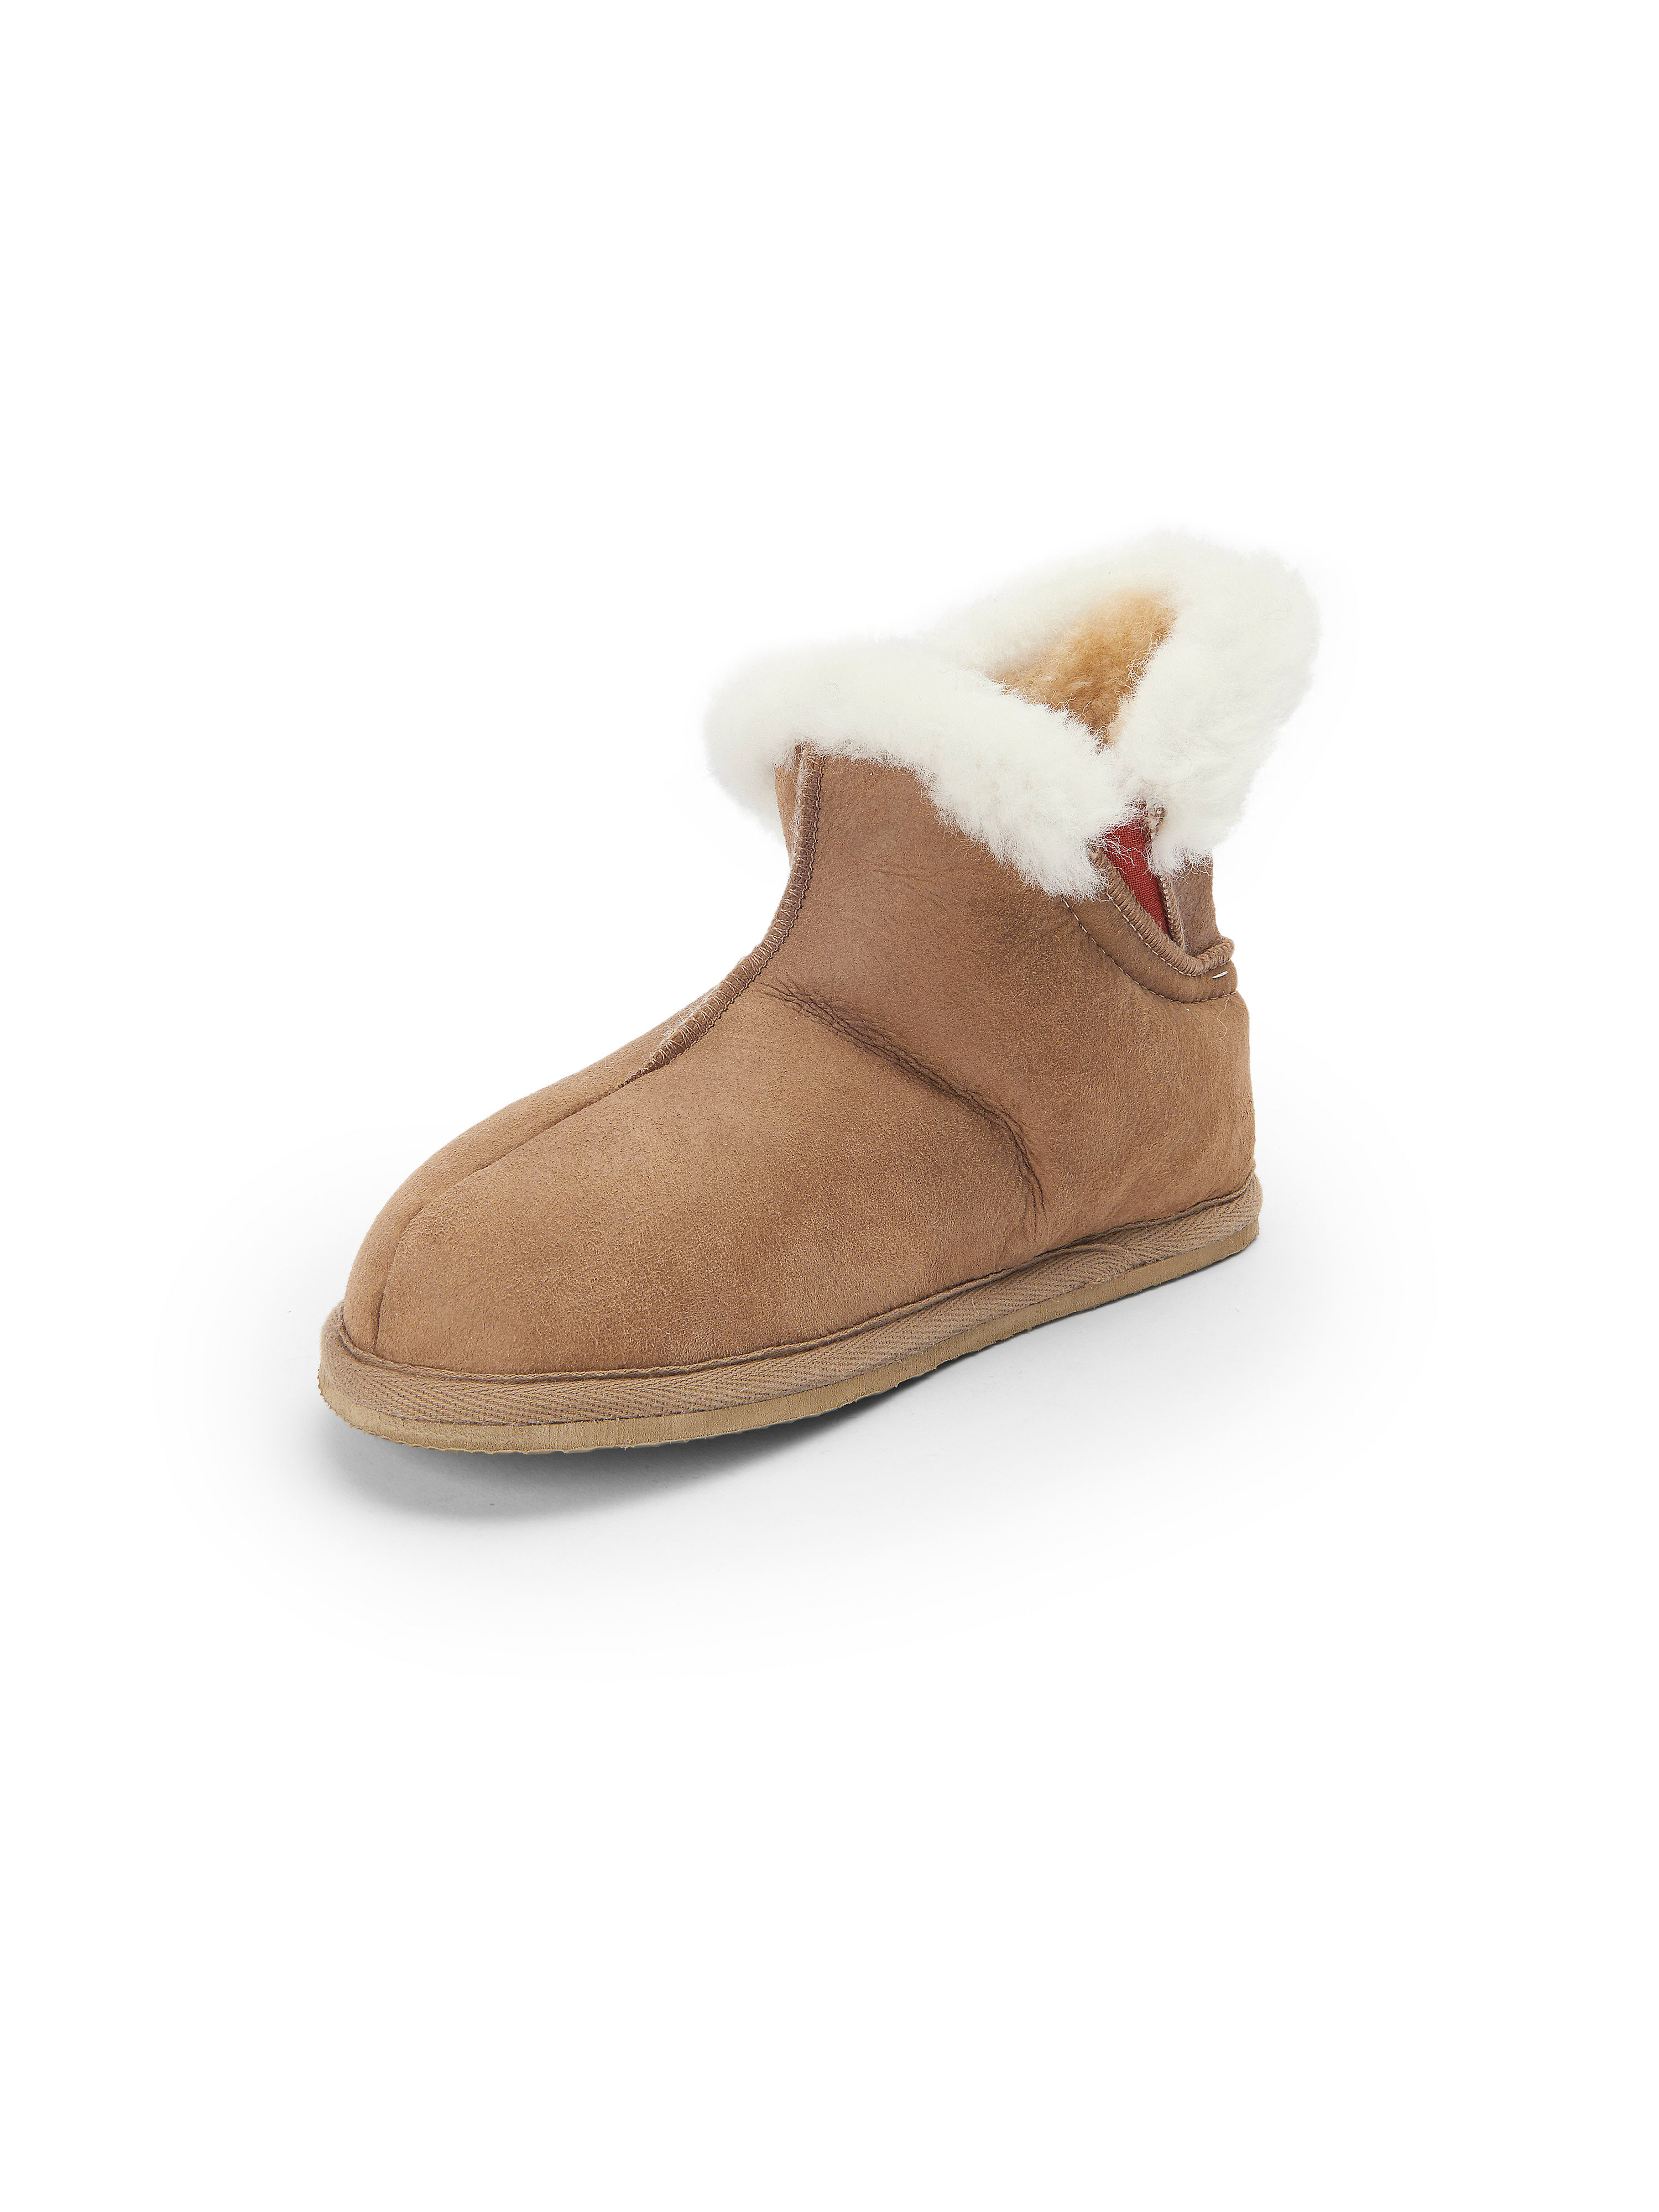 Pantoffels Van Shepherd bruin